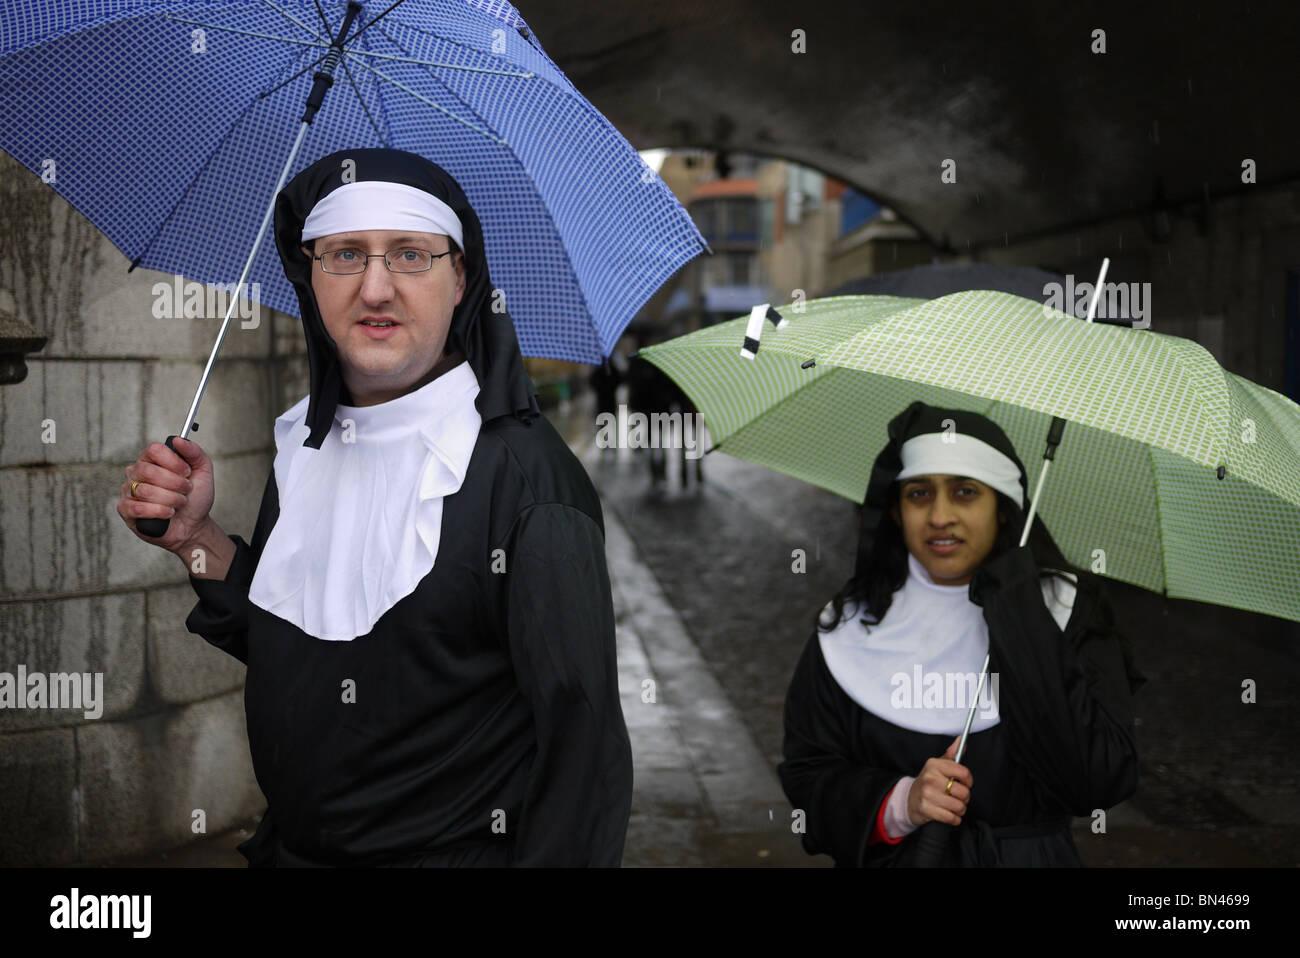 Nonnen auf der Charity Run laufen in London England UK Stockbild